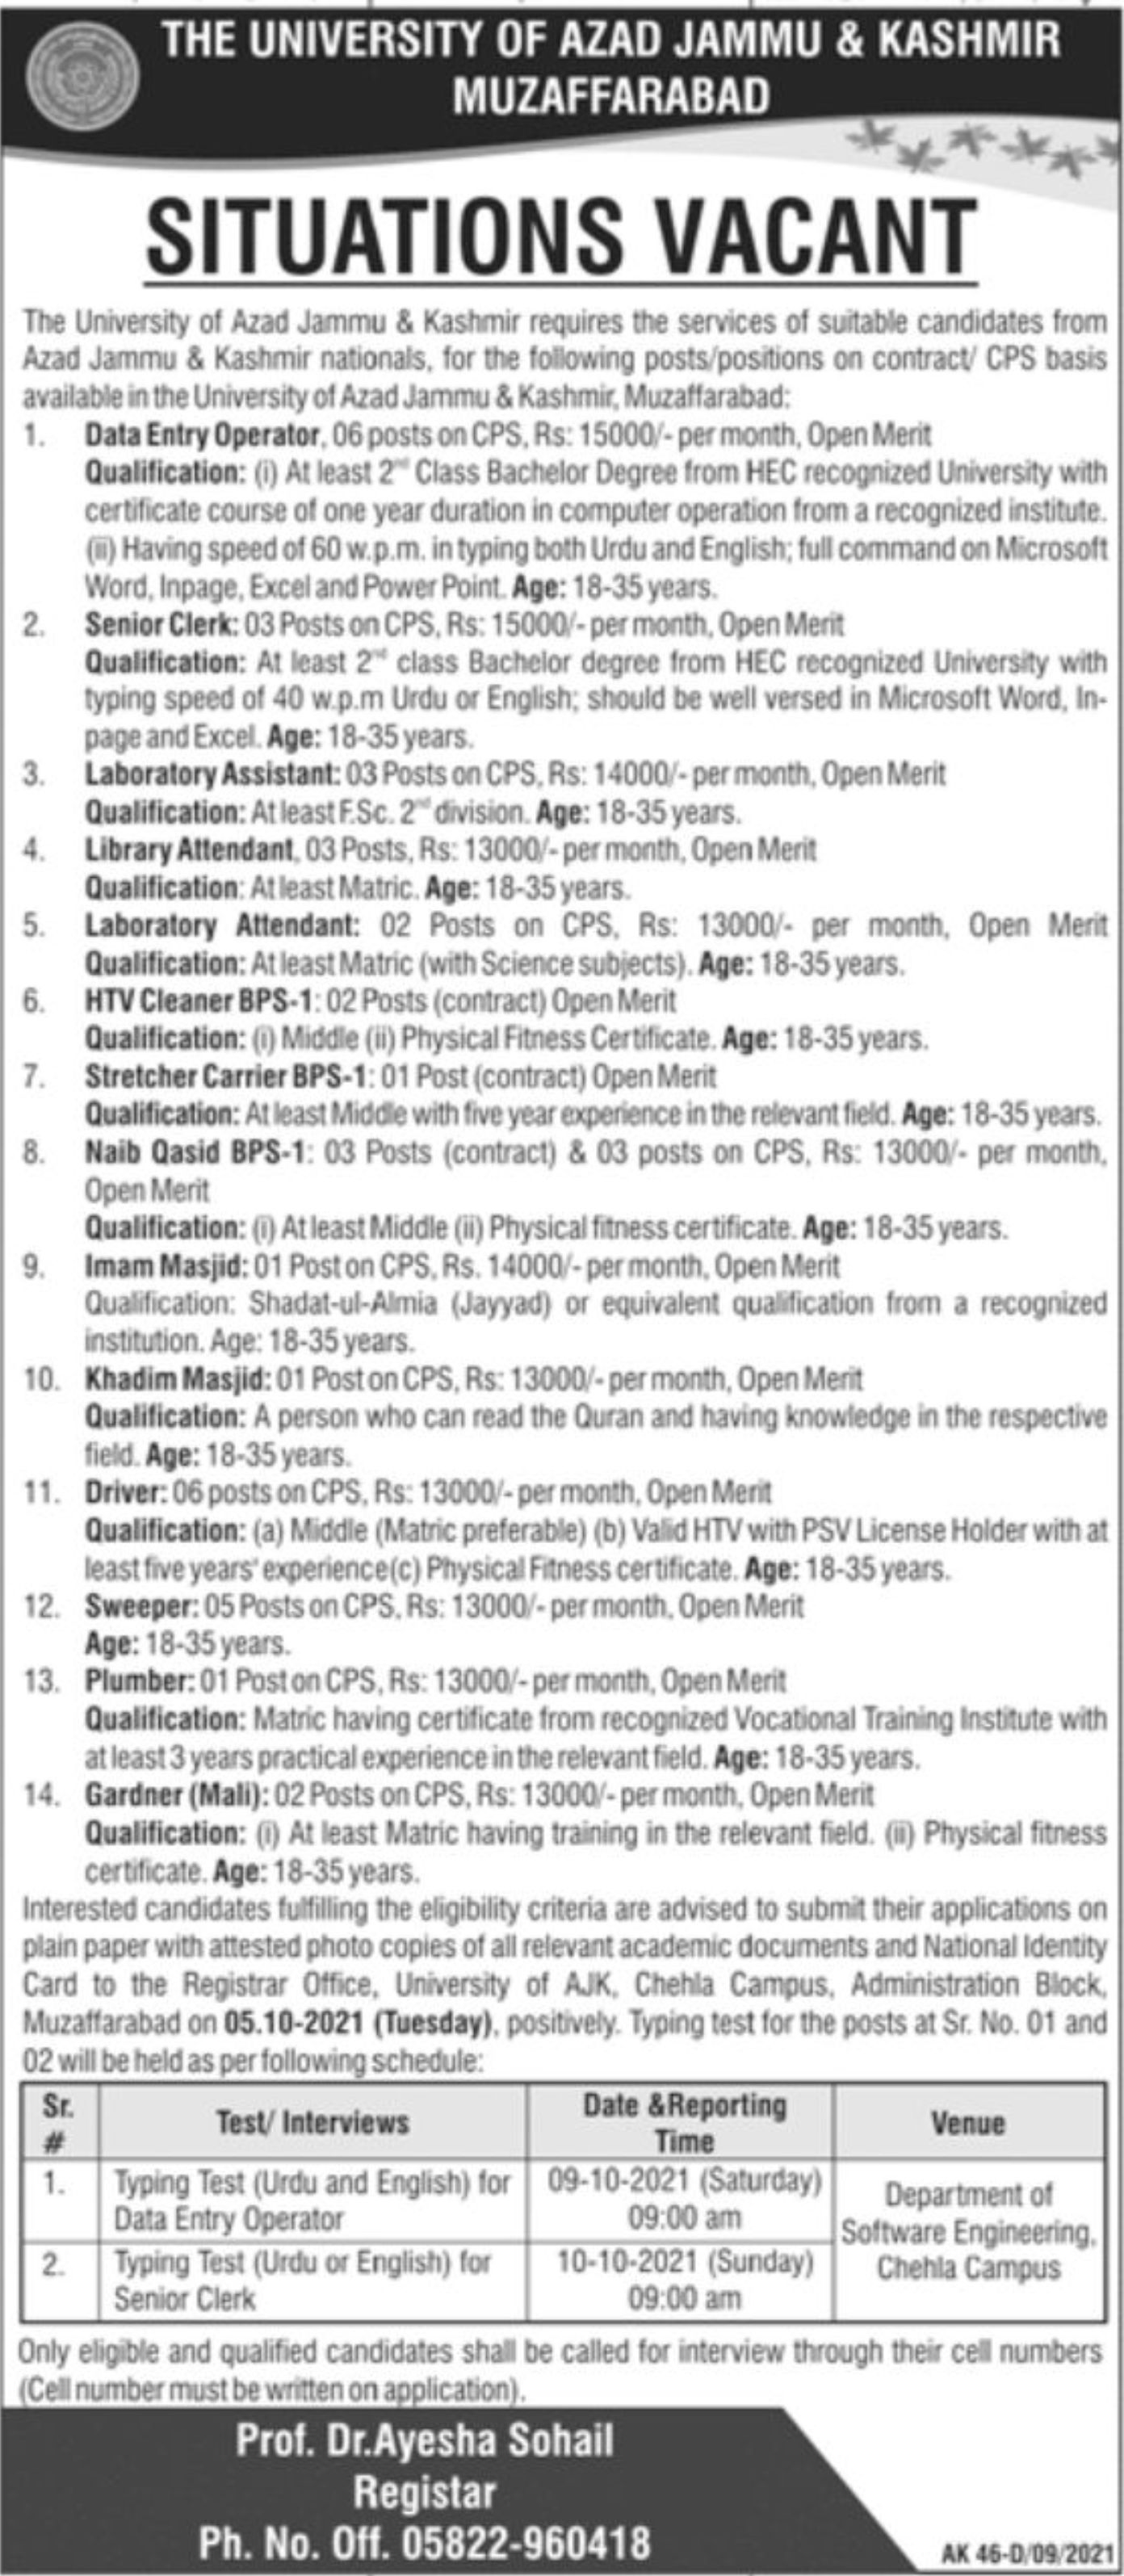 The University of Azad Jammu & Kashmir Muzaffarabad Vacancies 2021 – Latest Jobs 3